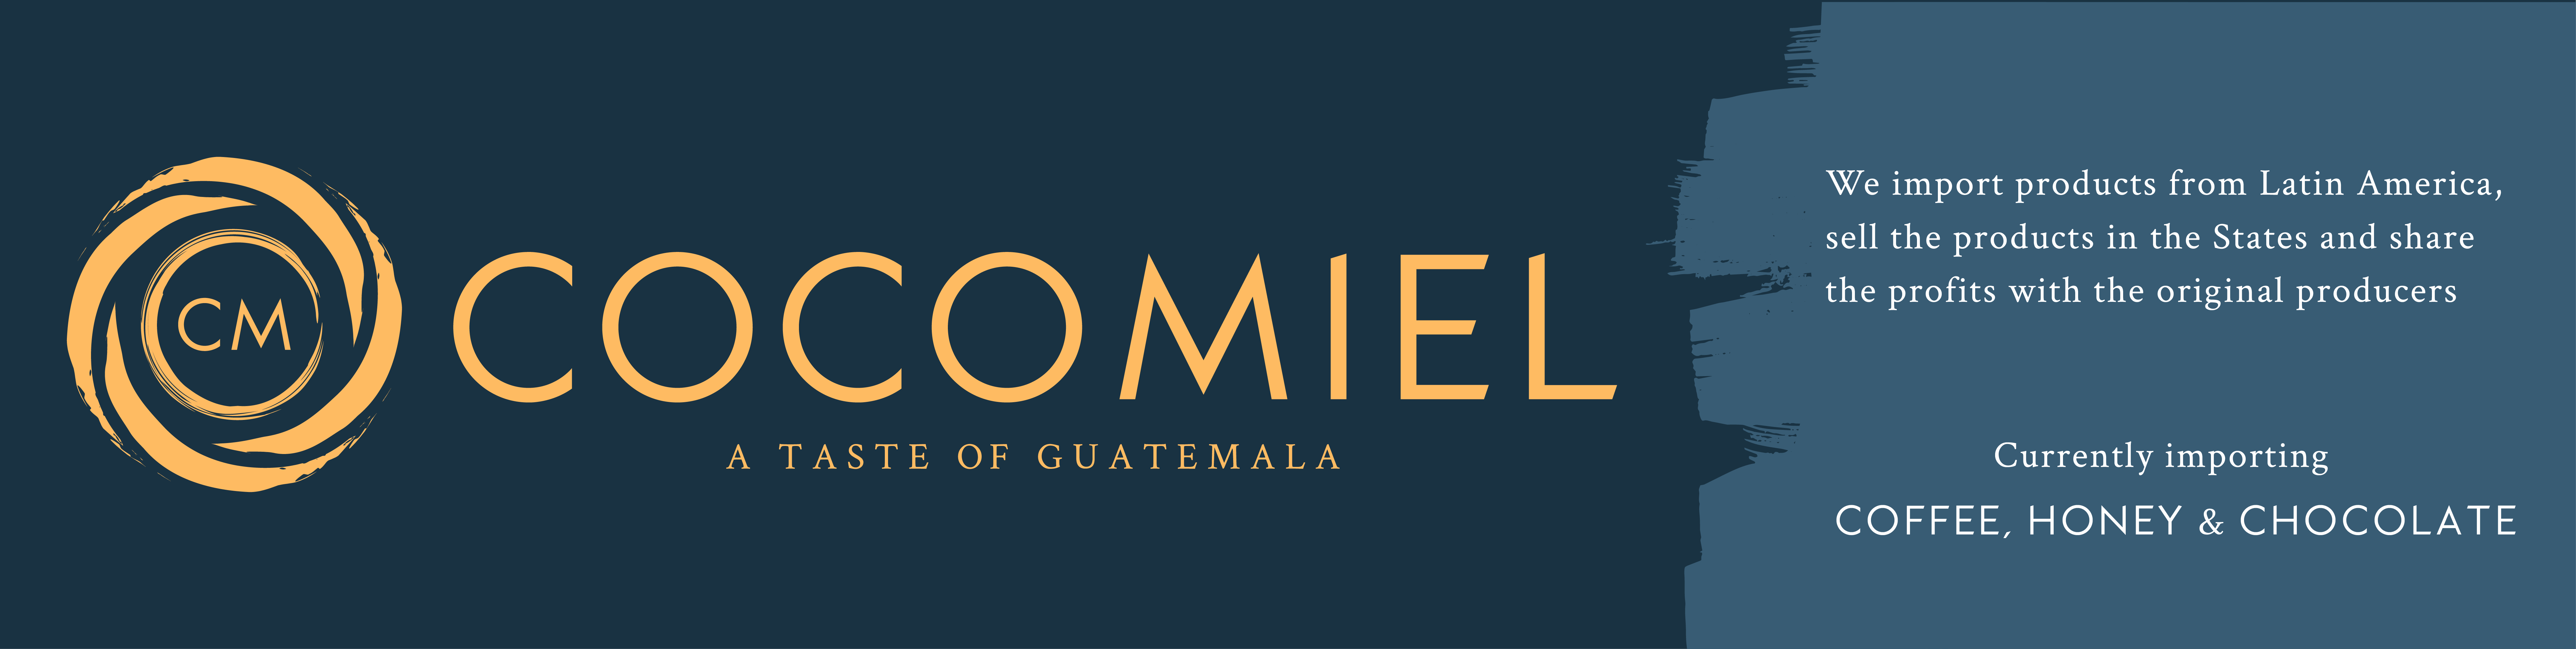 CocoMiel